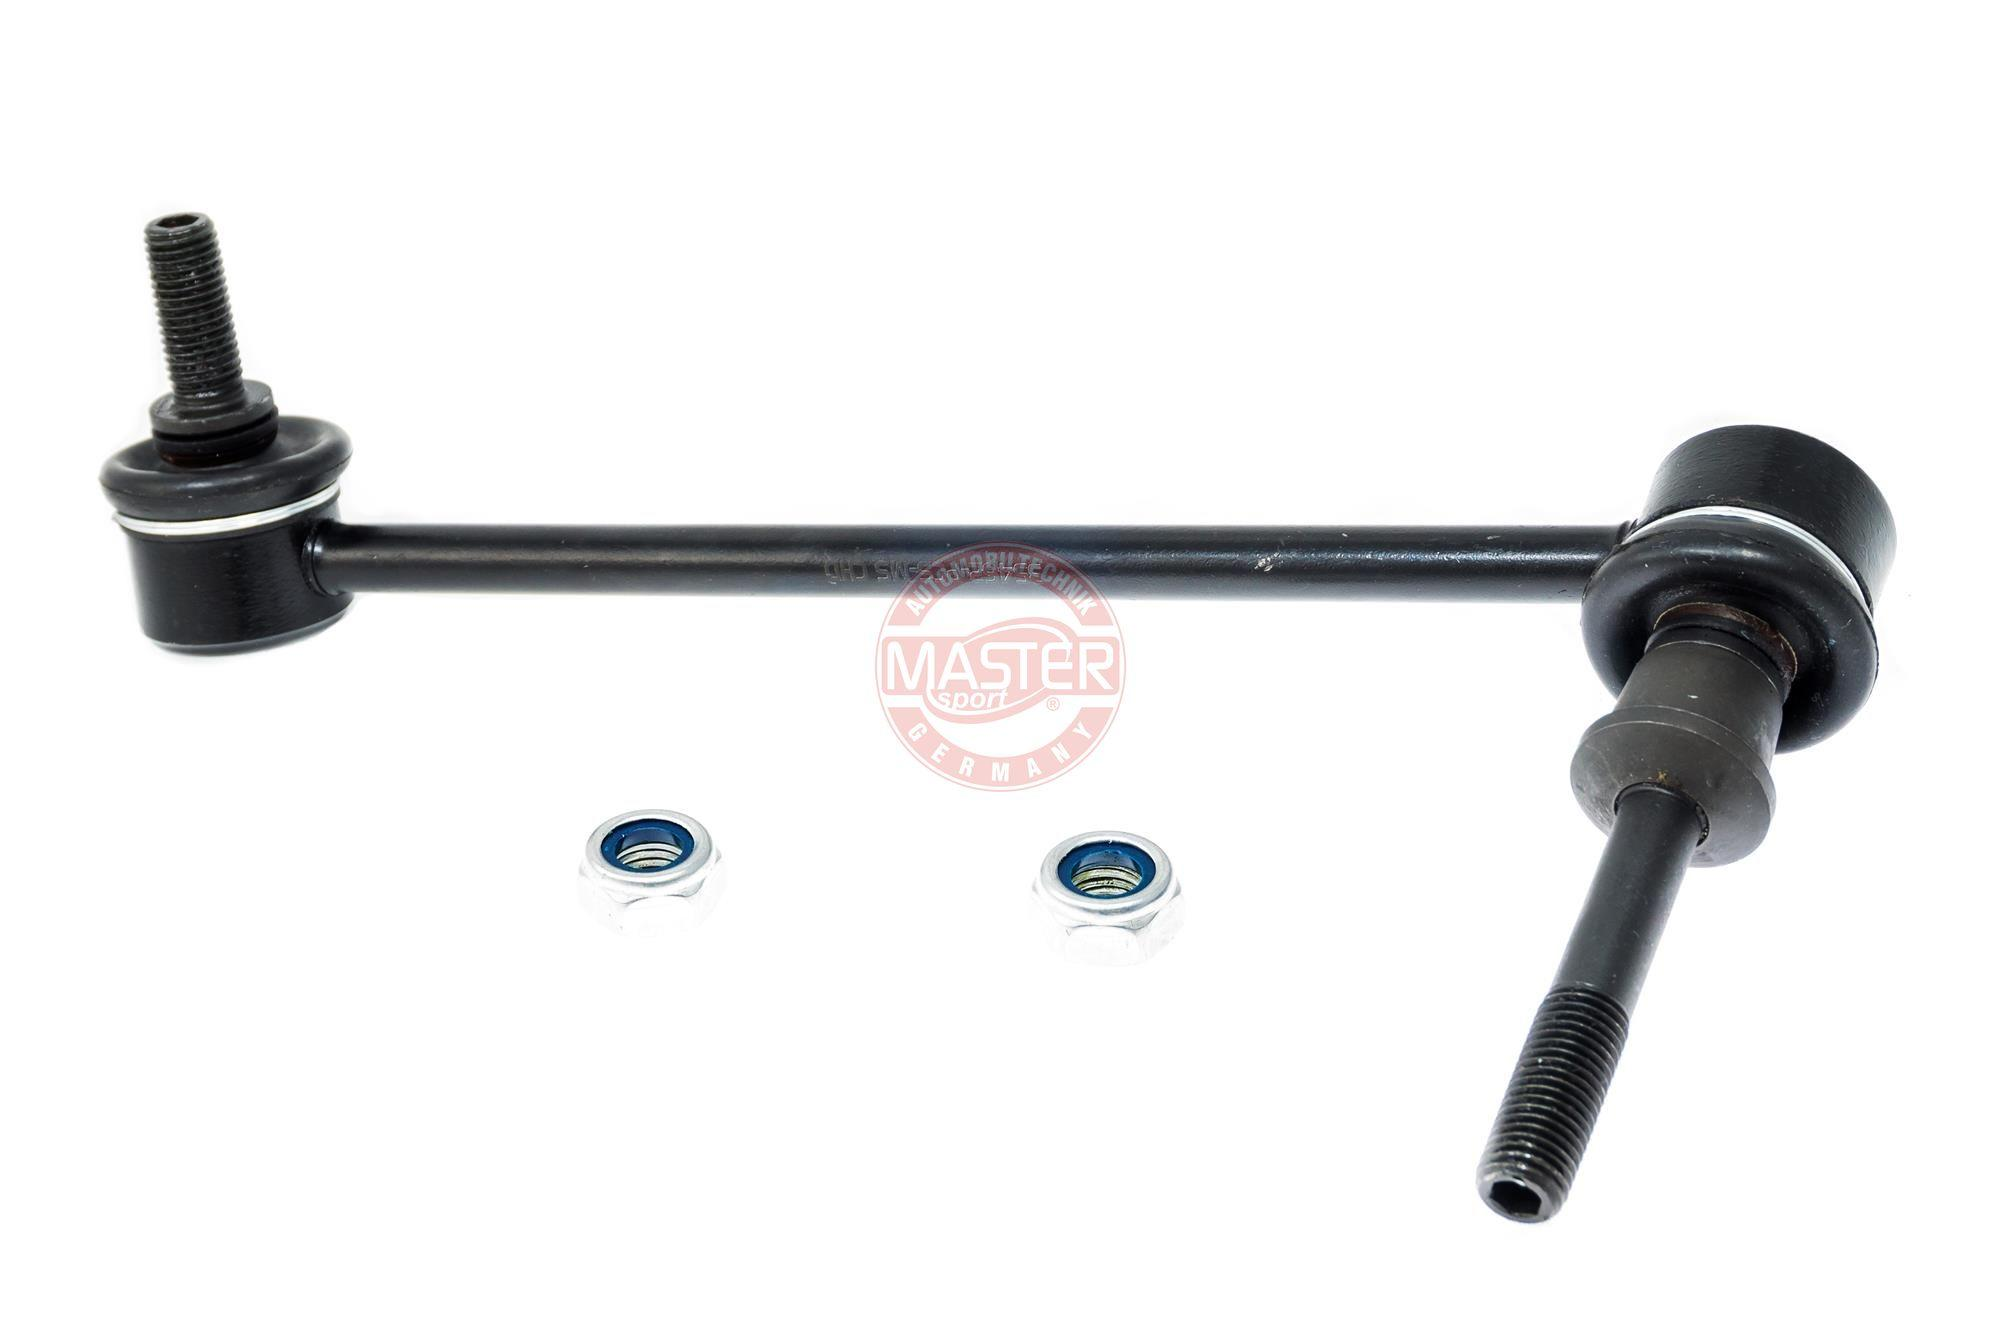 Koppelstange 35462-PCS-MS MASTER-SPORT 133546201 in Original Qualität